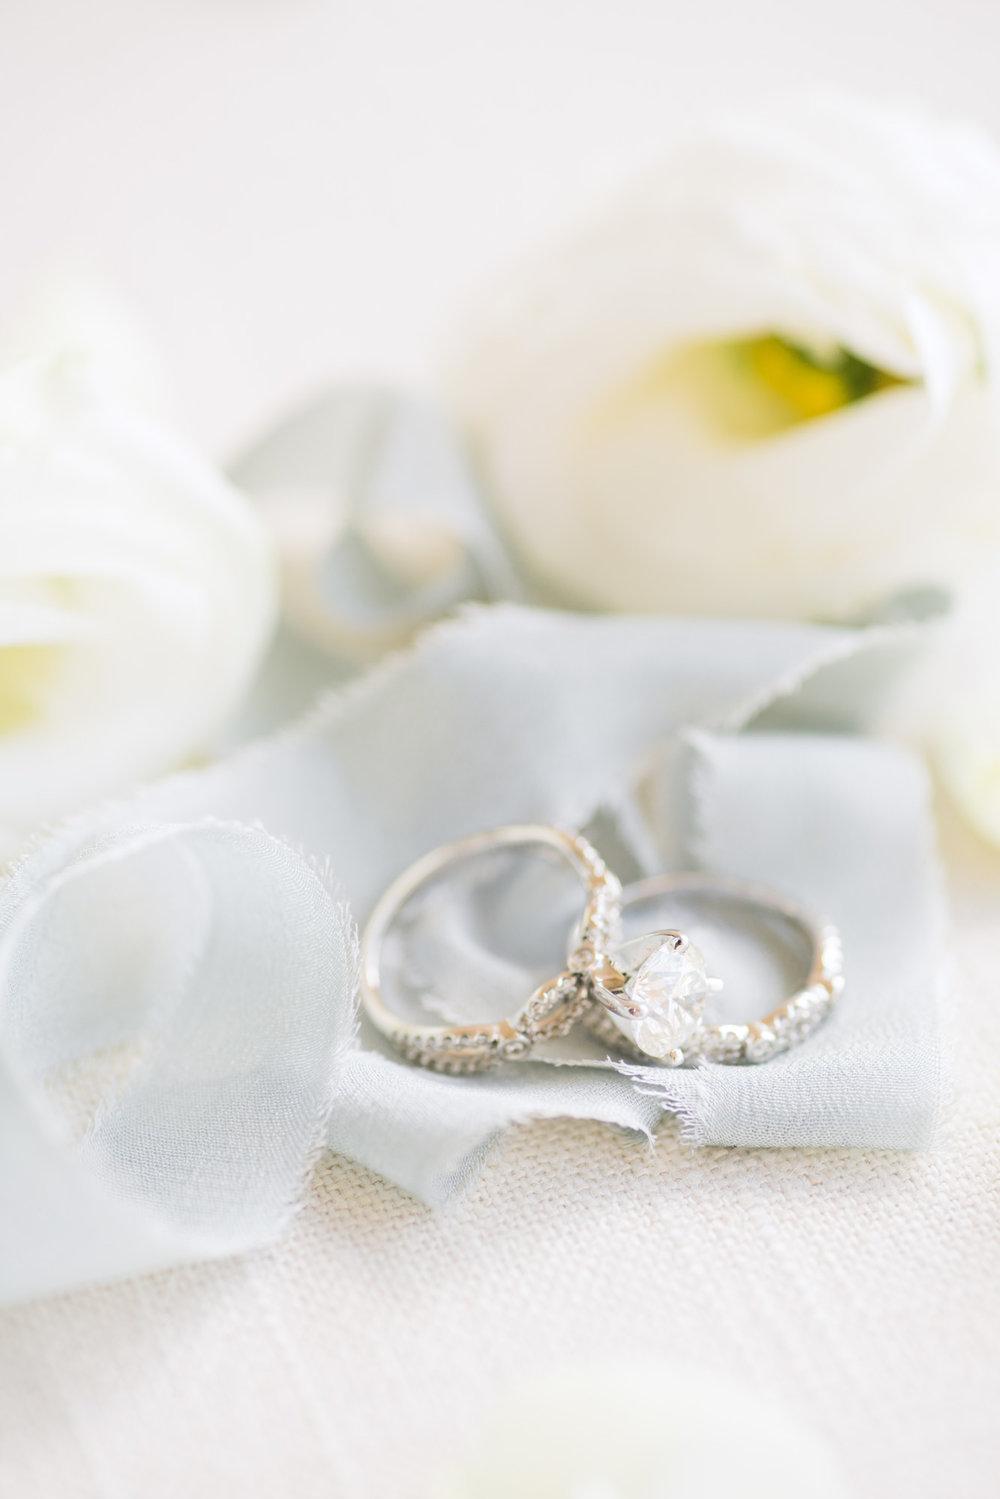 marco-beach-ocean-resort-naples-florida-wedding-photographer-hunter-ryan-photo-04623.jpg